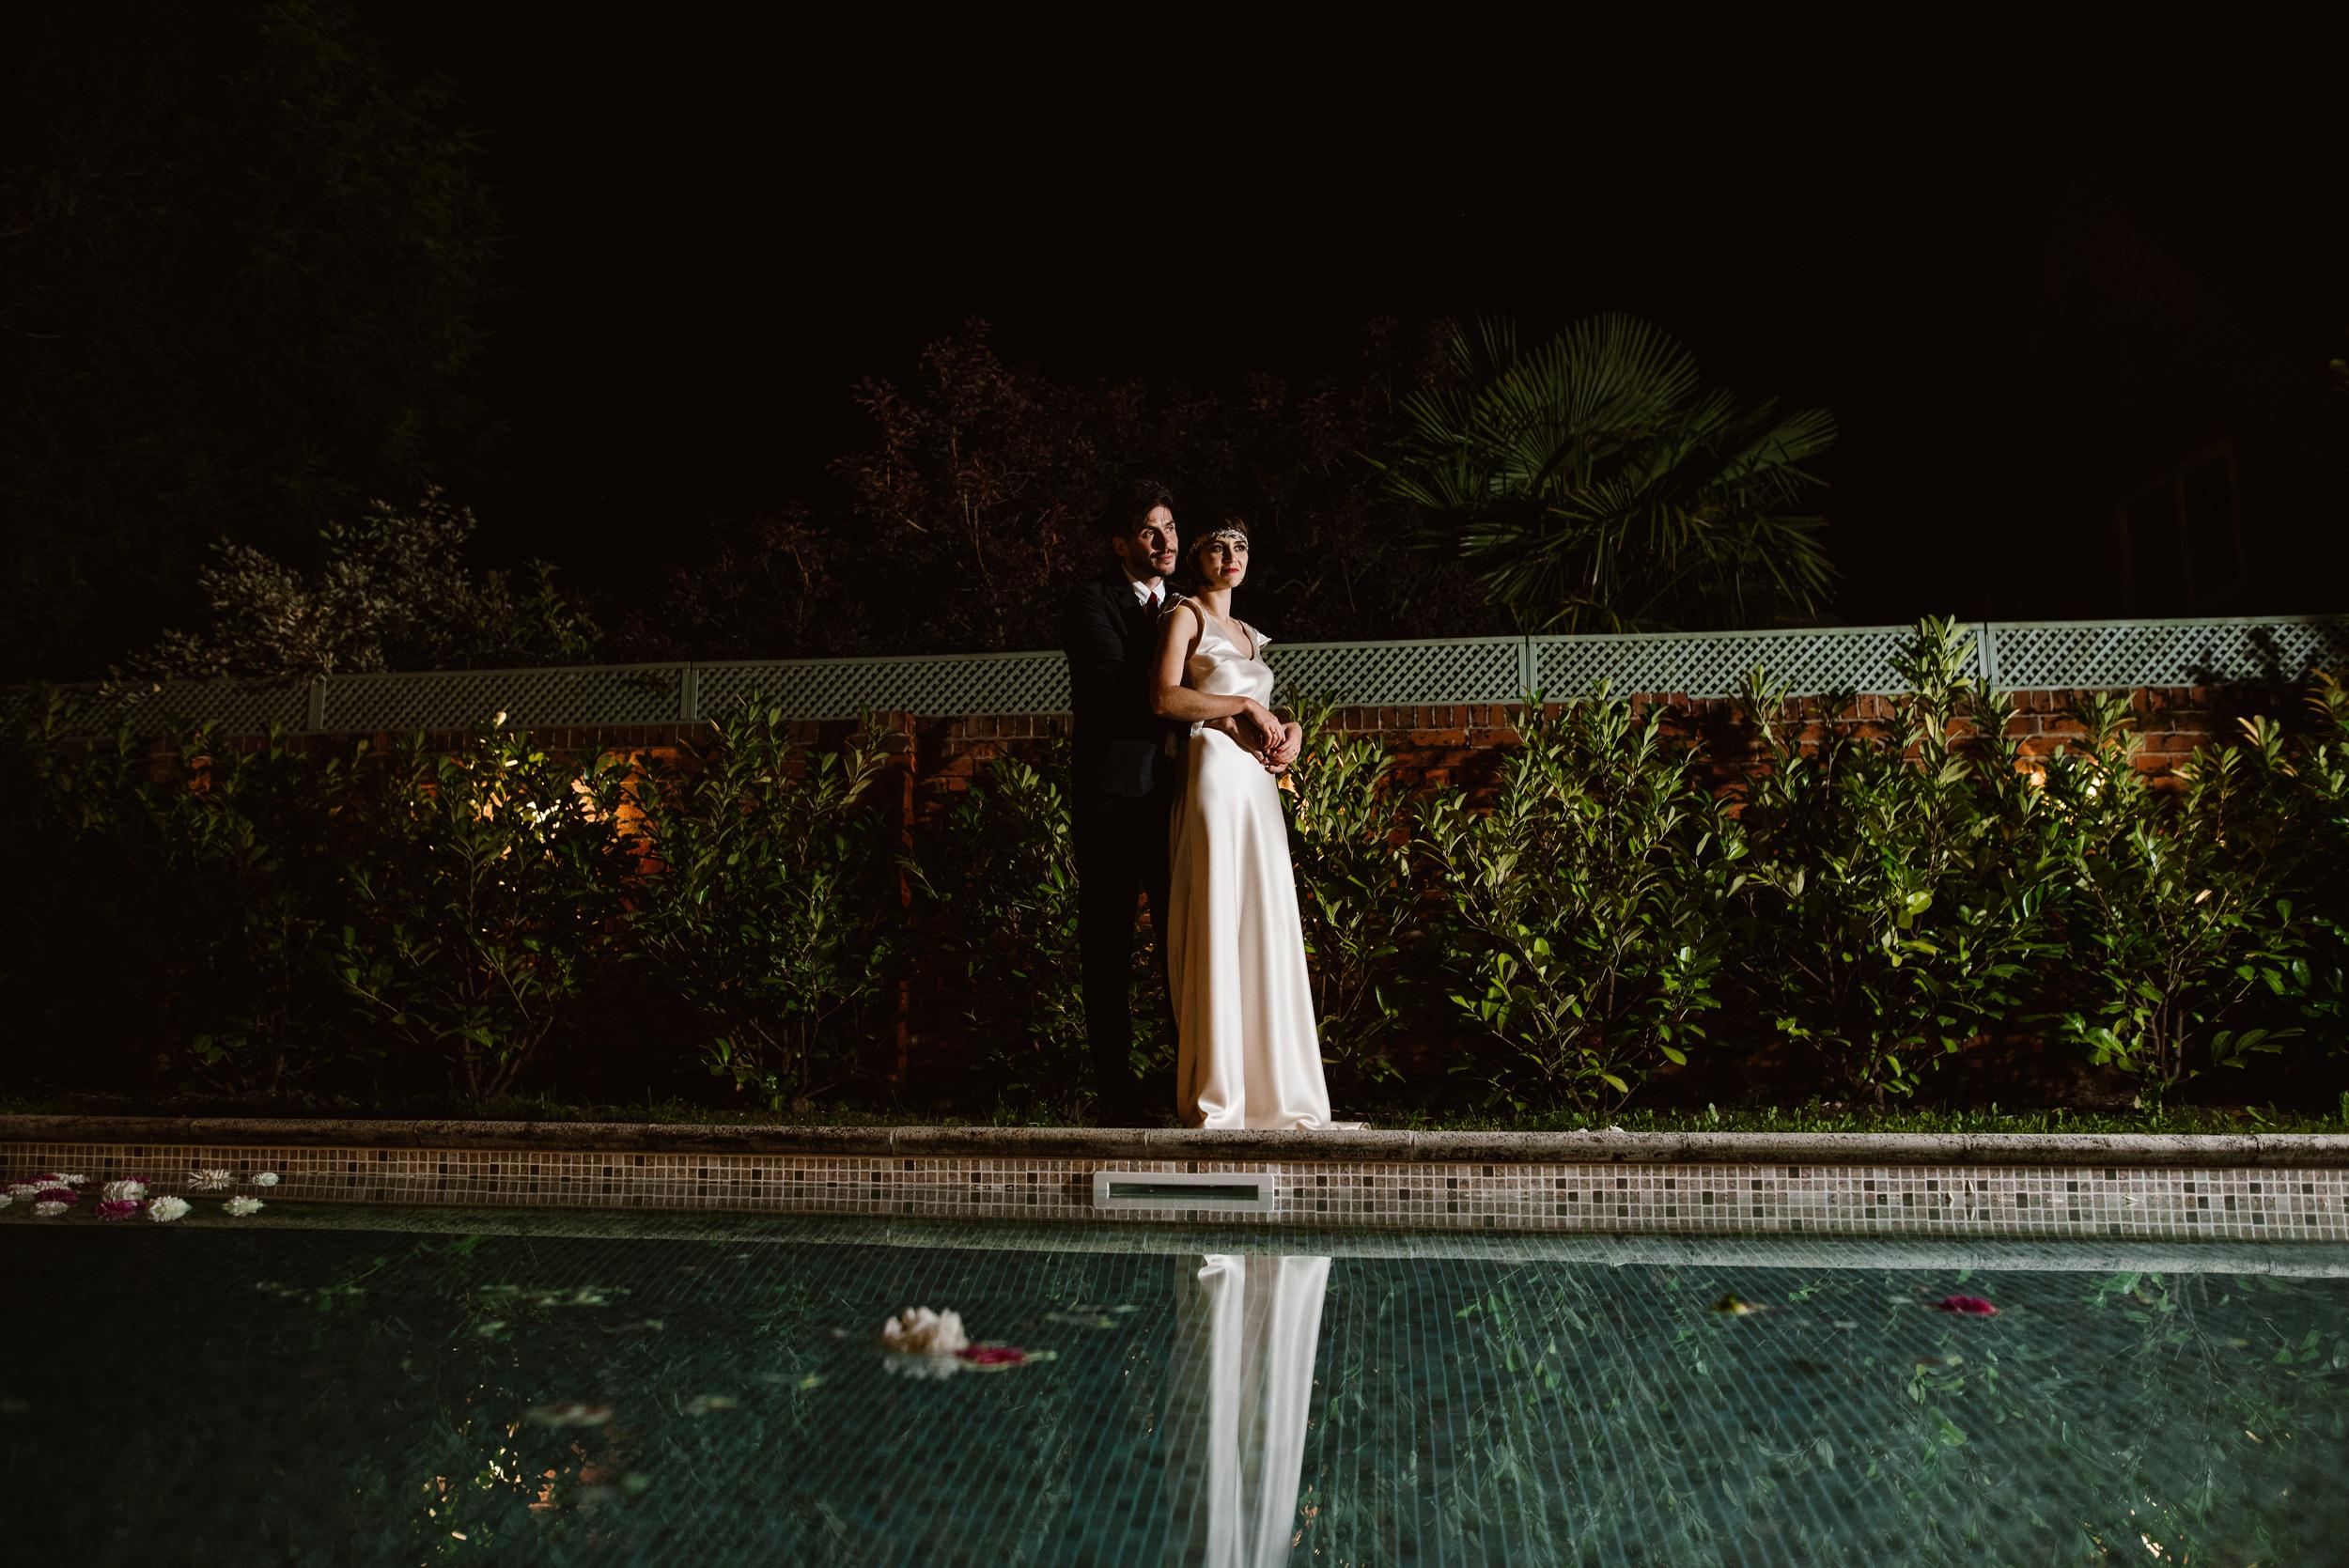 Ro-Kate-Beaumont-bias-cut-silk-wedding-gown-back-garden-wedding-by-Ellie-Gillard-34.jpg